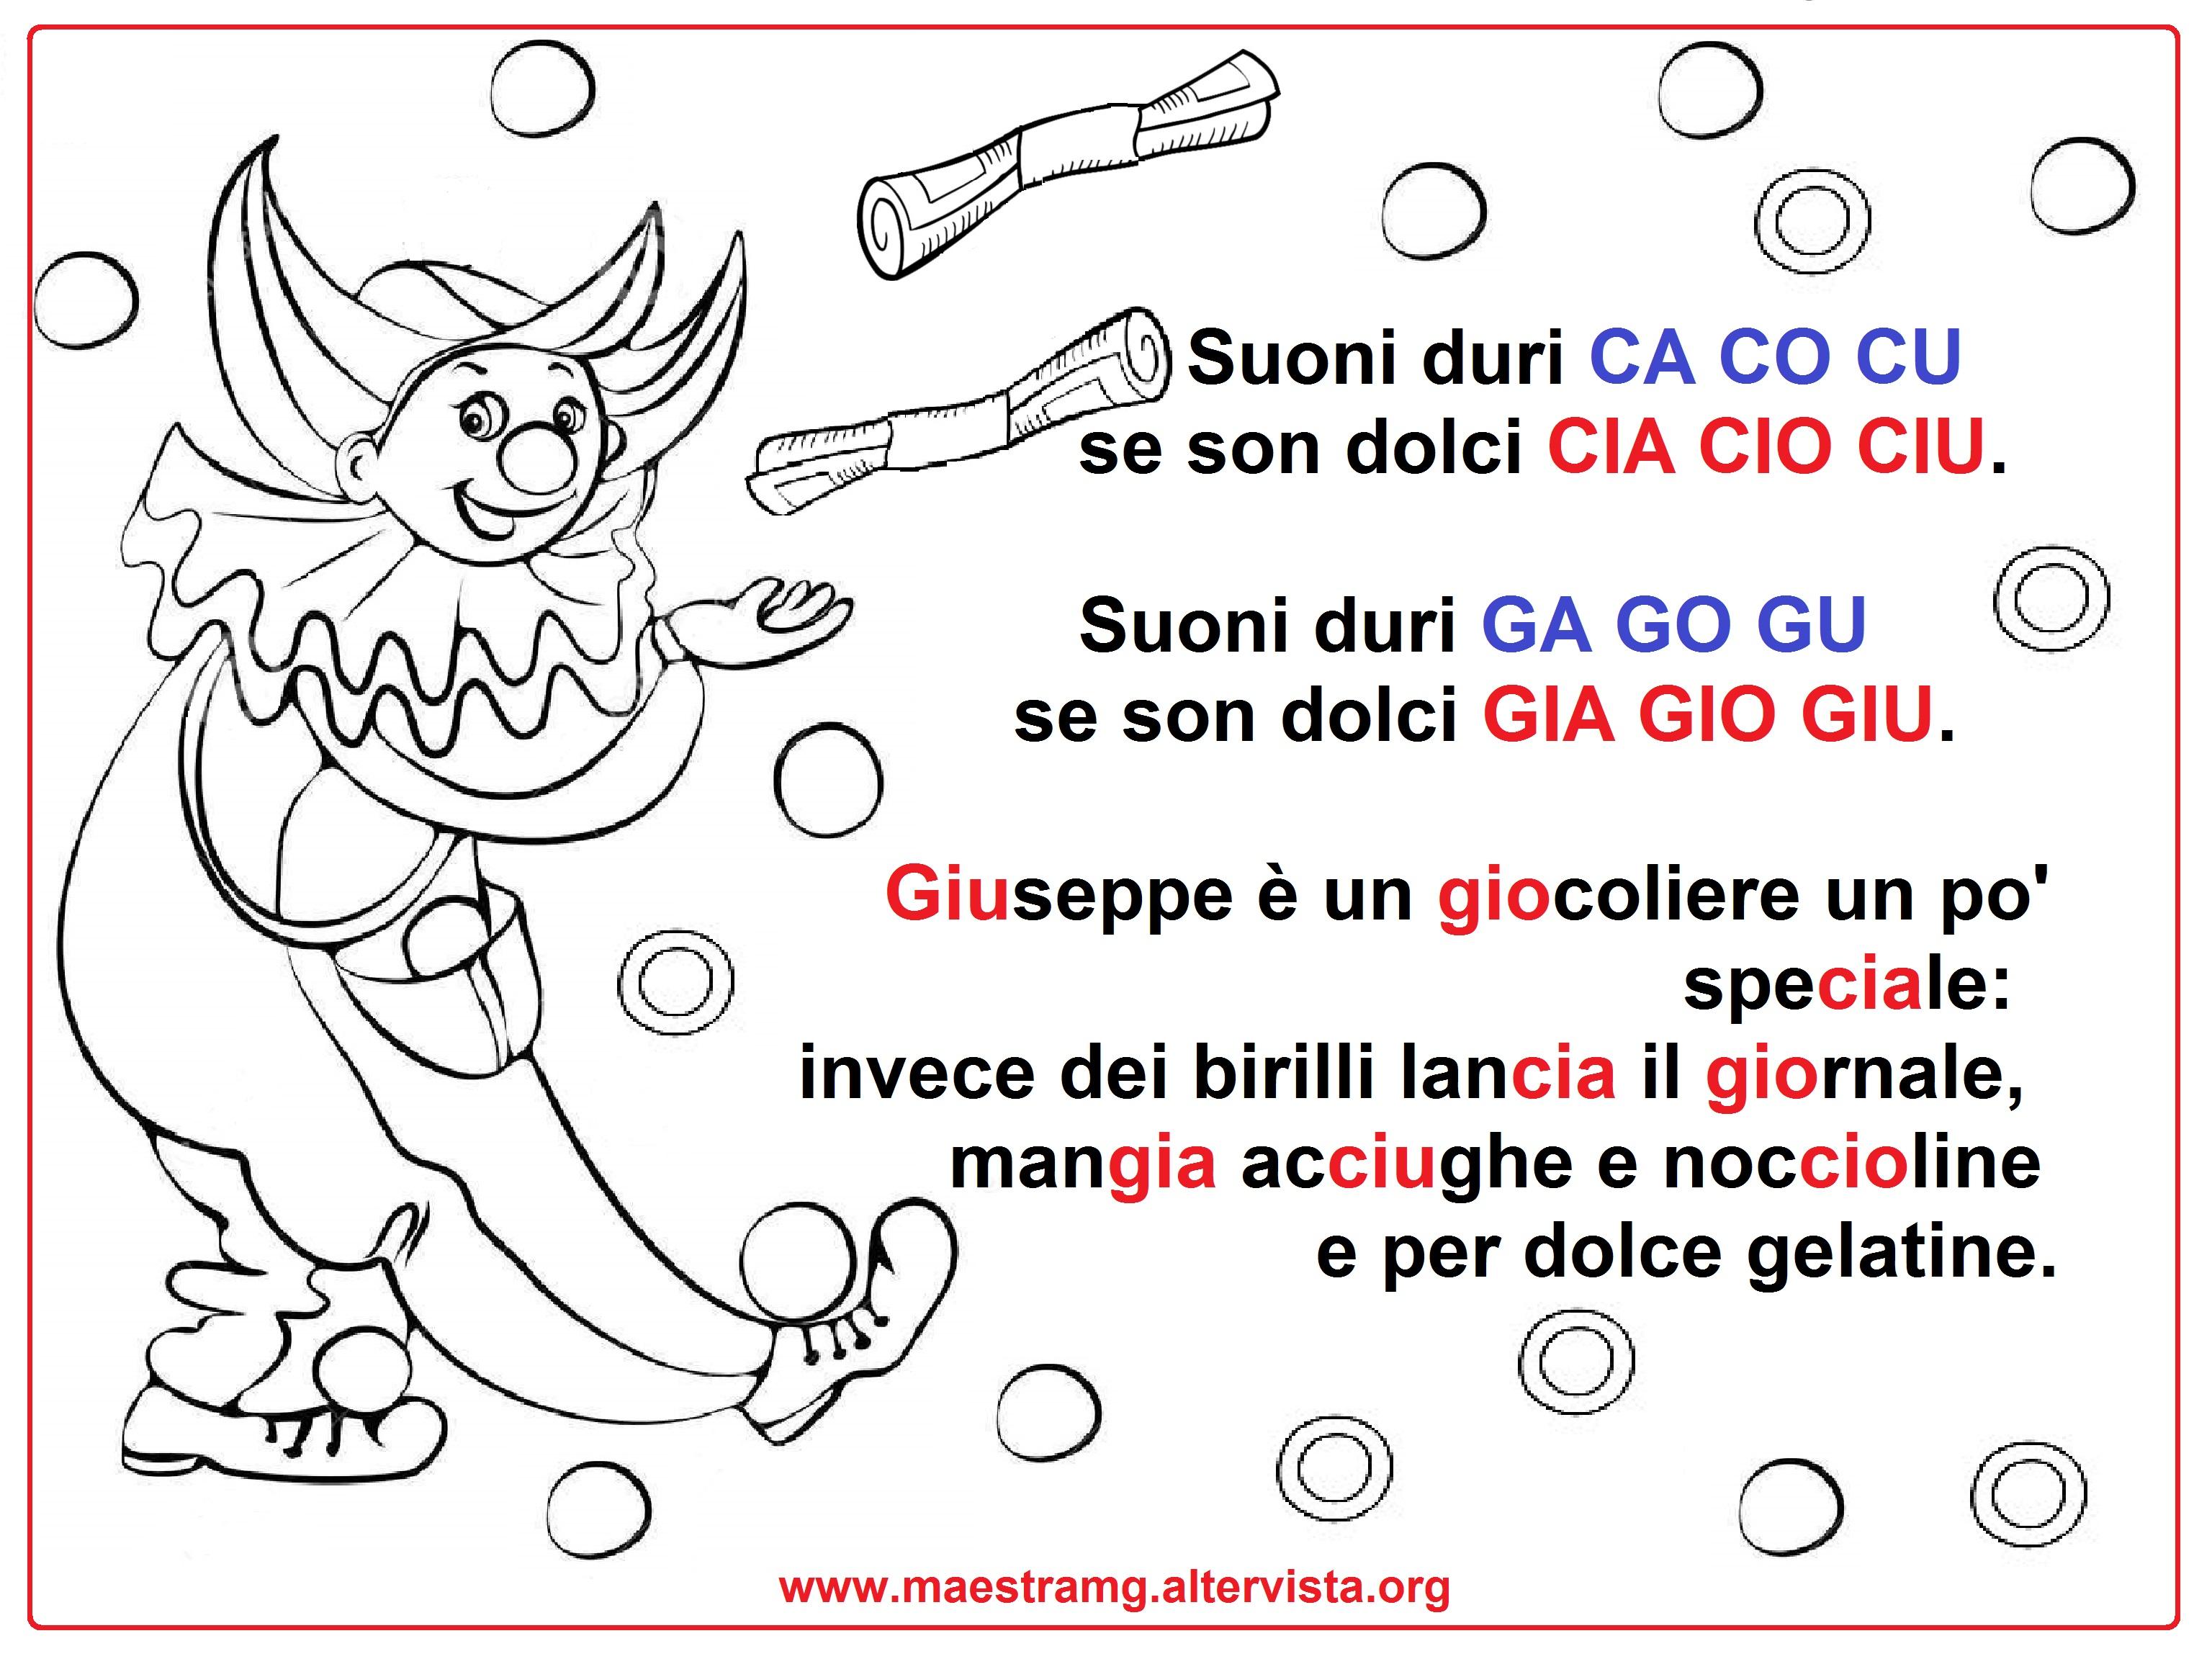 Amato Filastrocche | MAESTRA MG MAESTRA MG NN64